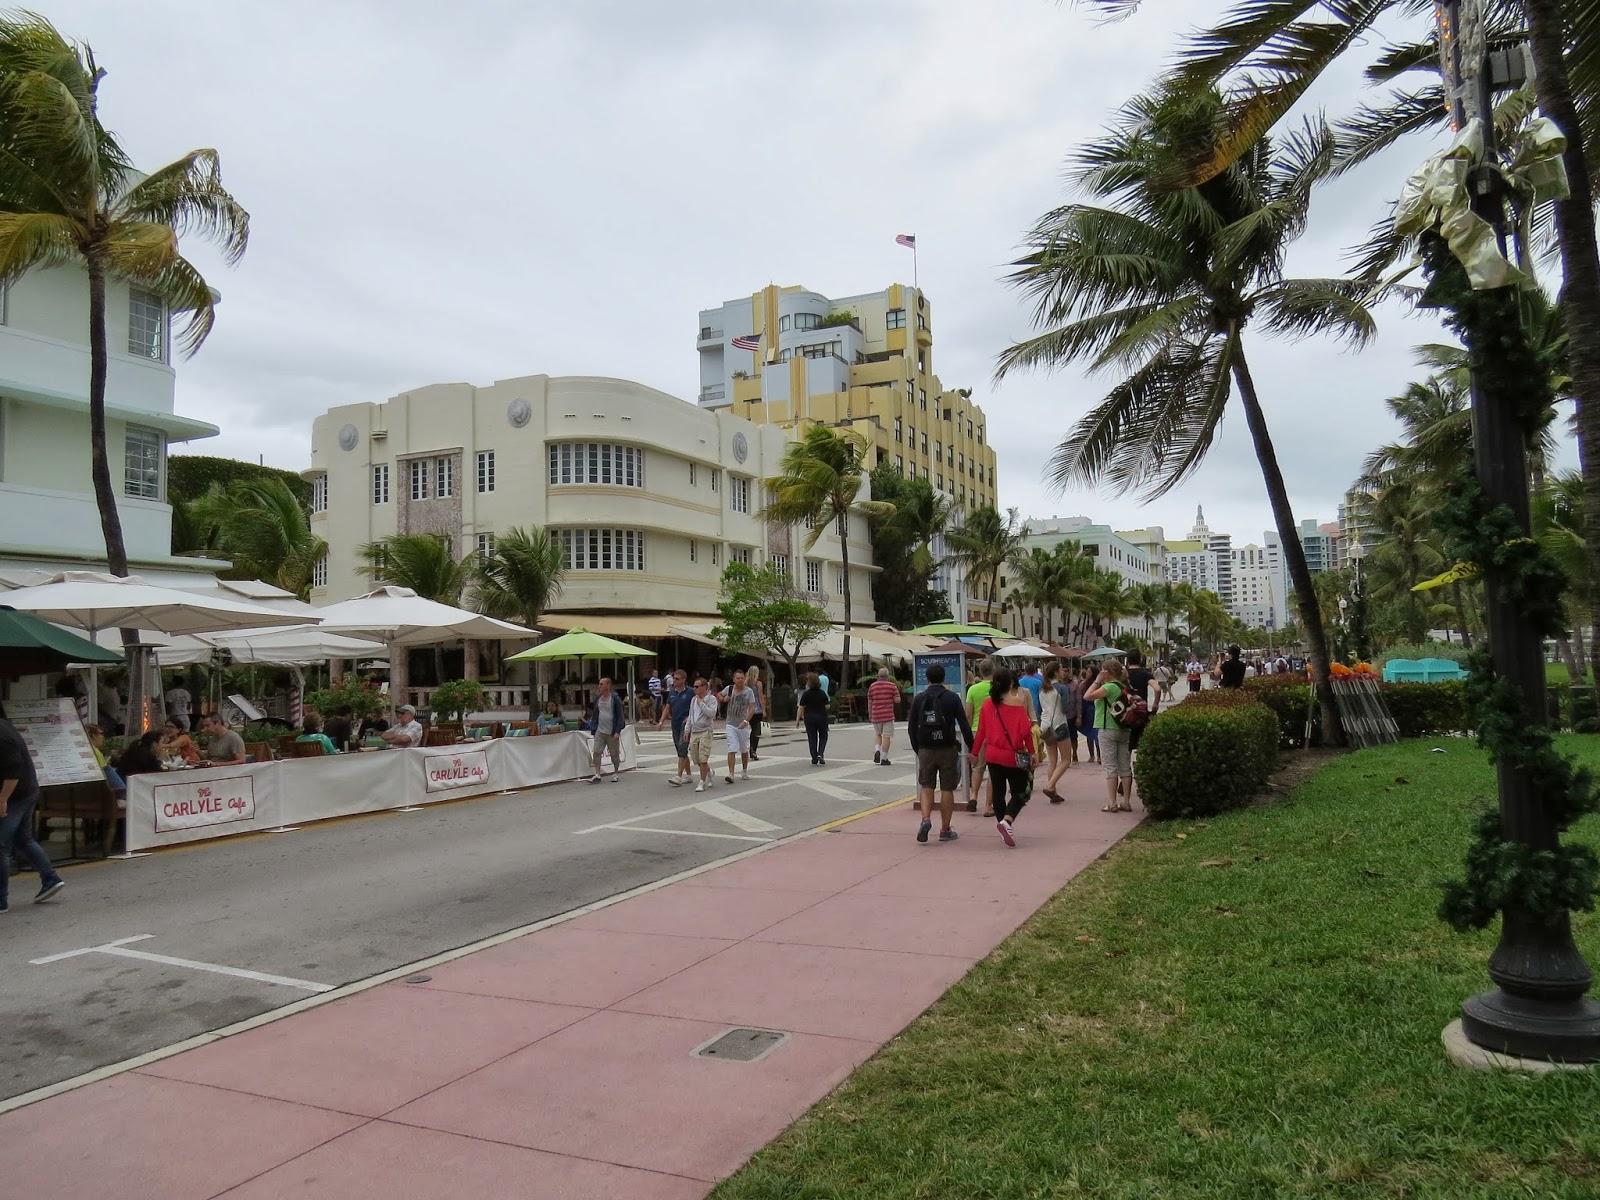 South Beach Miami - Trashy and overpriced